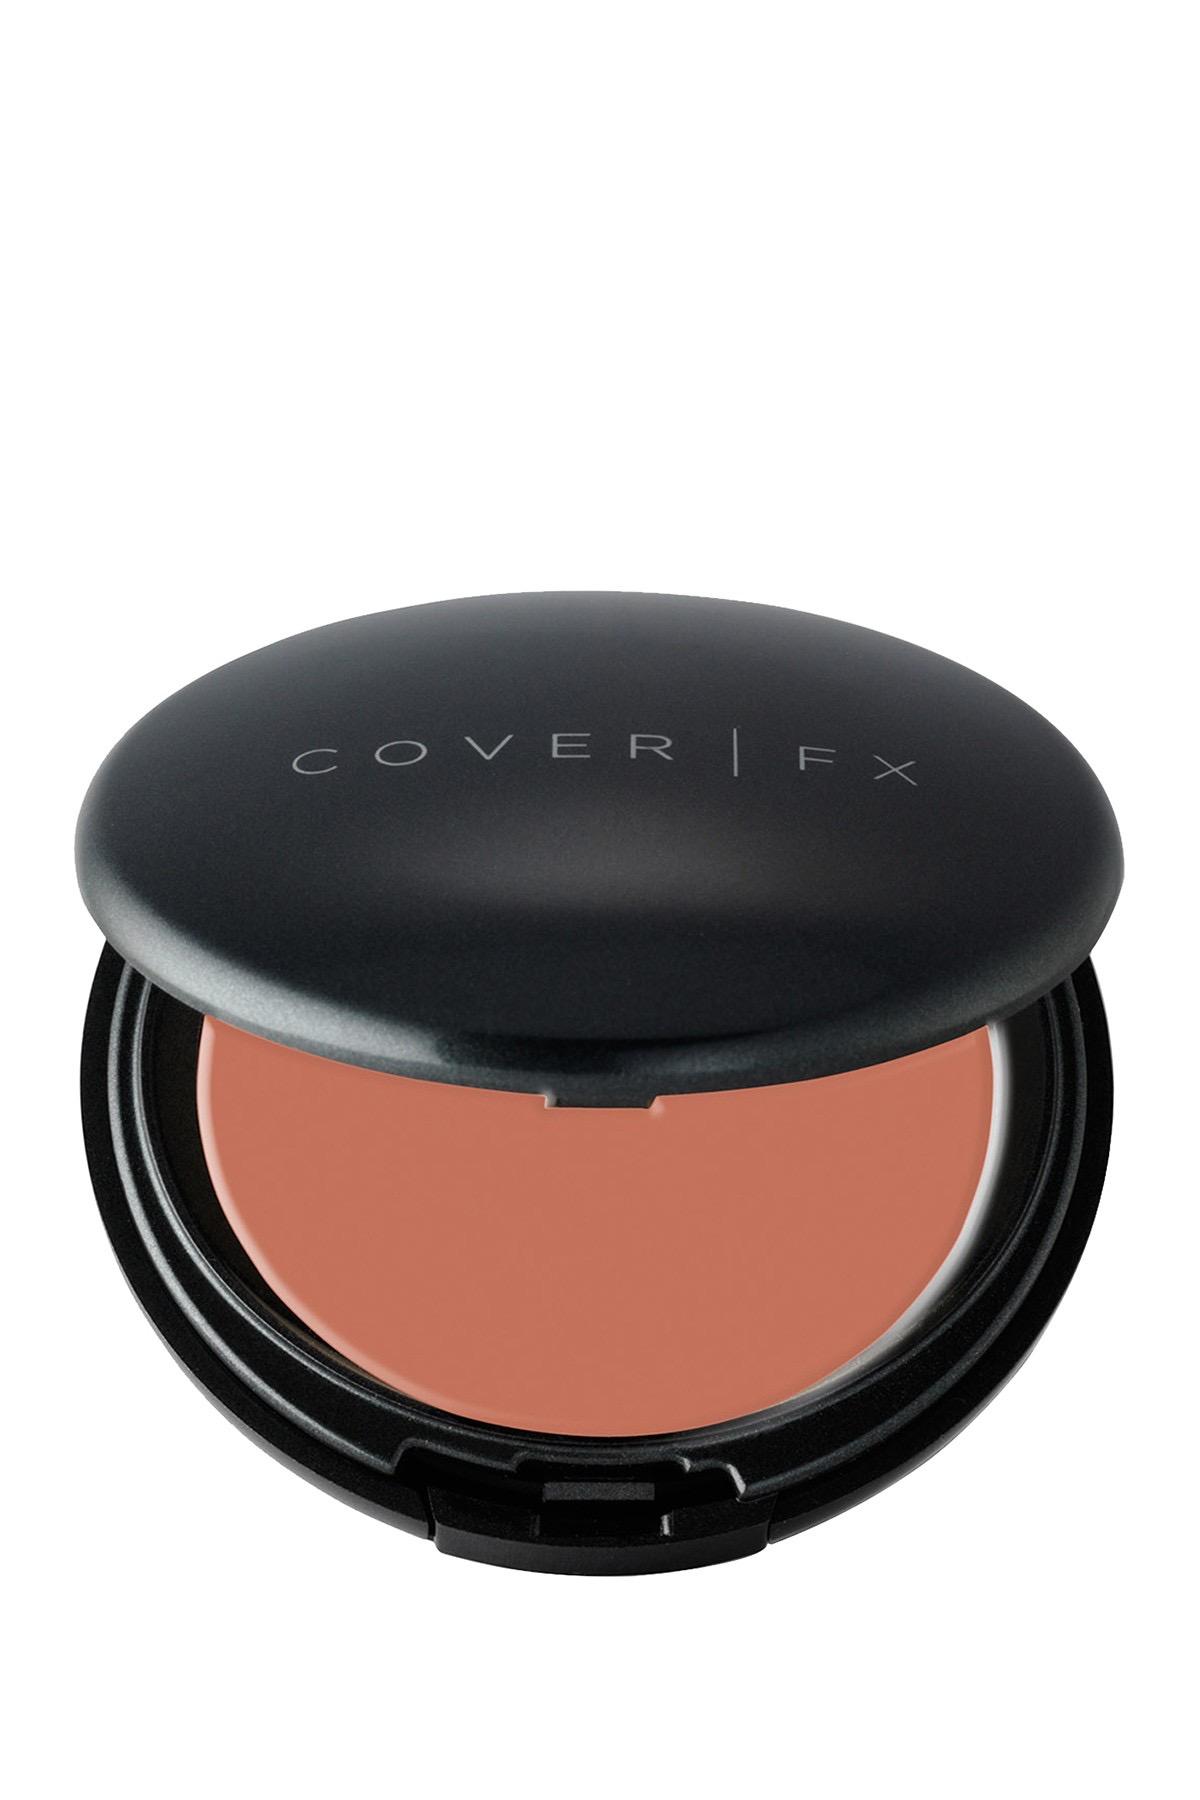 Cover FX Total Cover Cream Foundation - P100